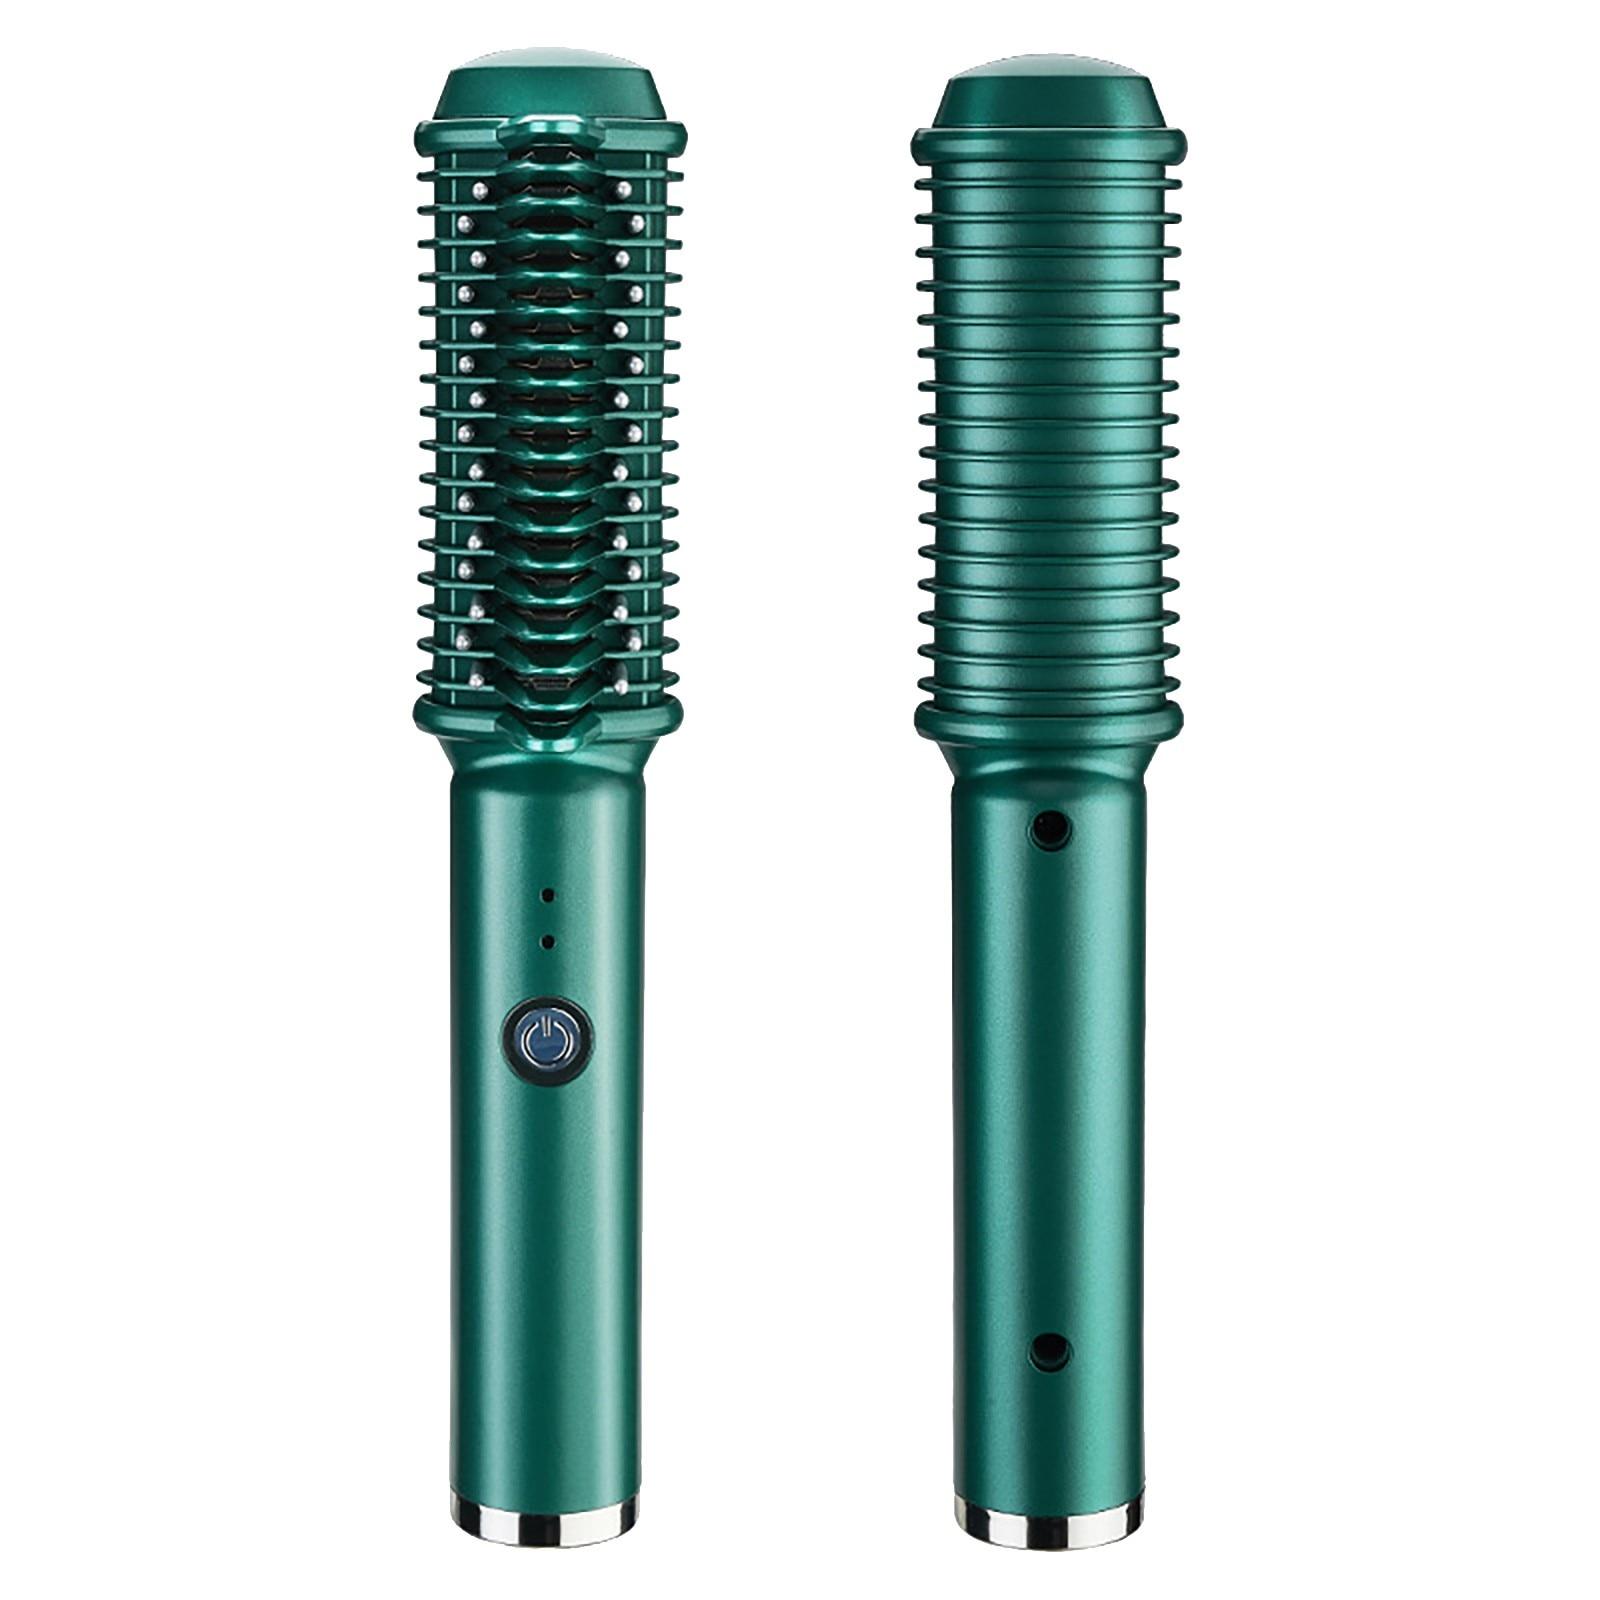 finalidade pente de cabeleireiro elétrico